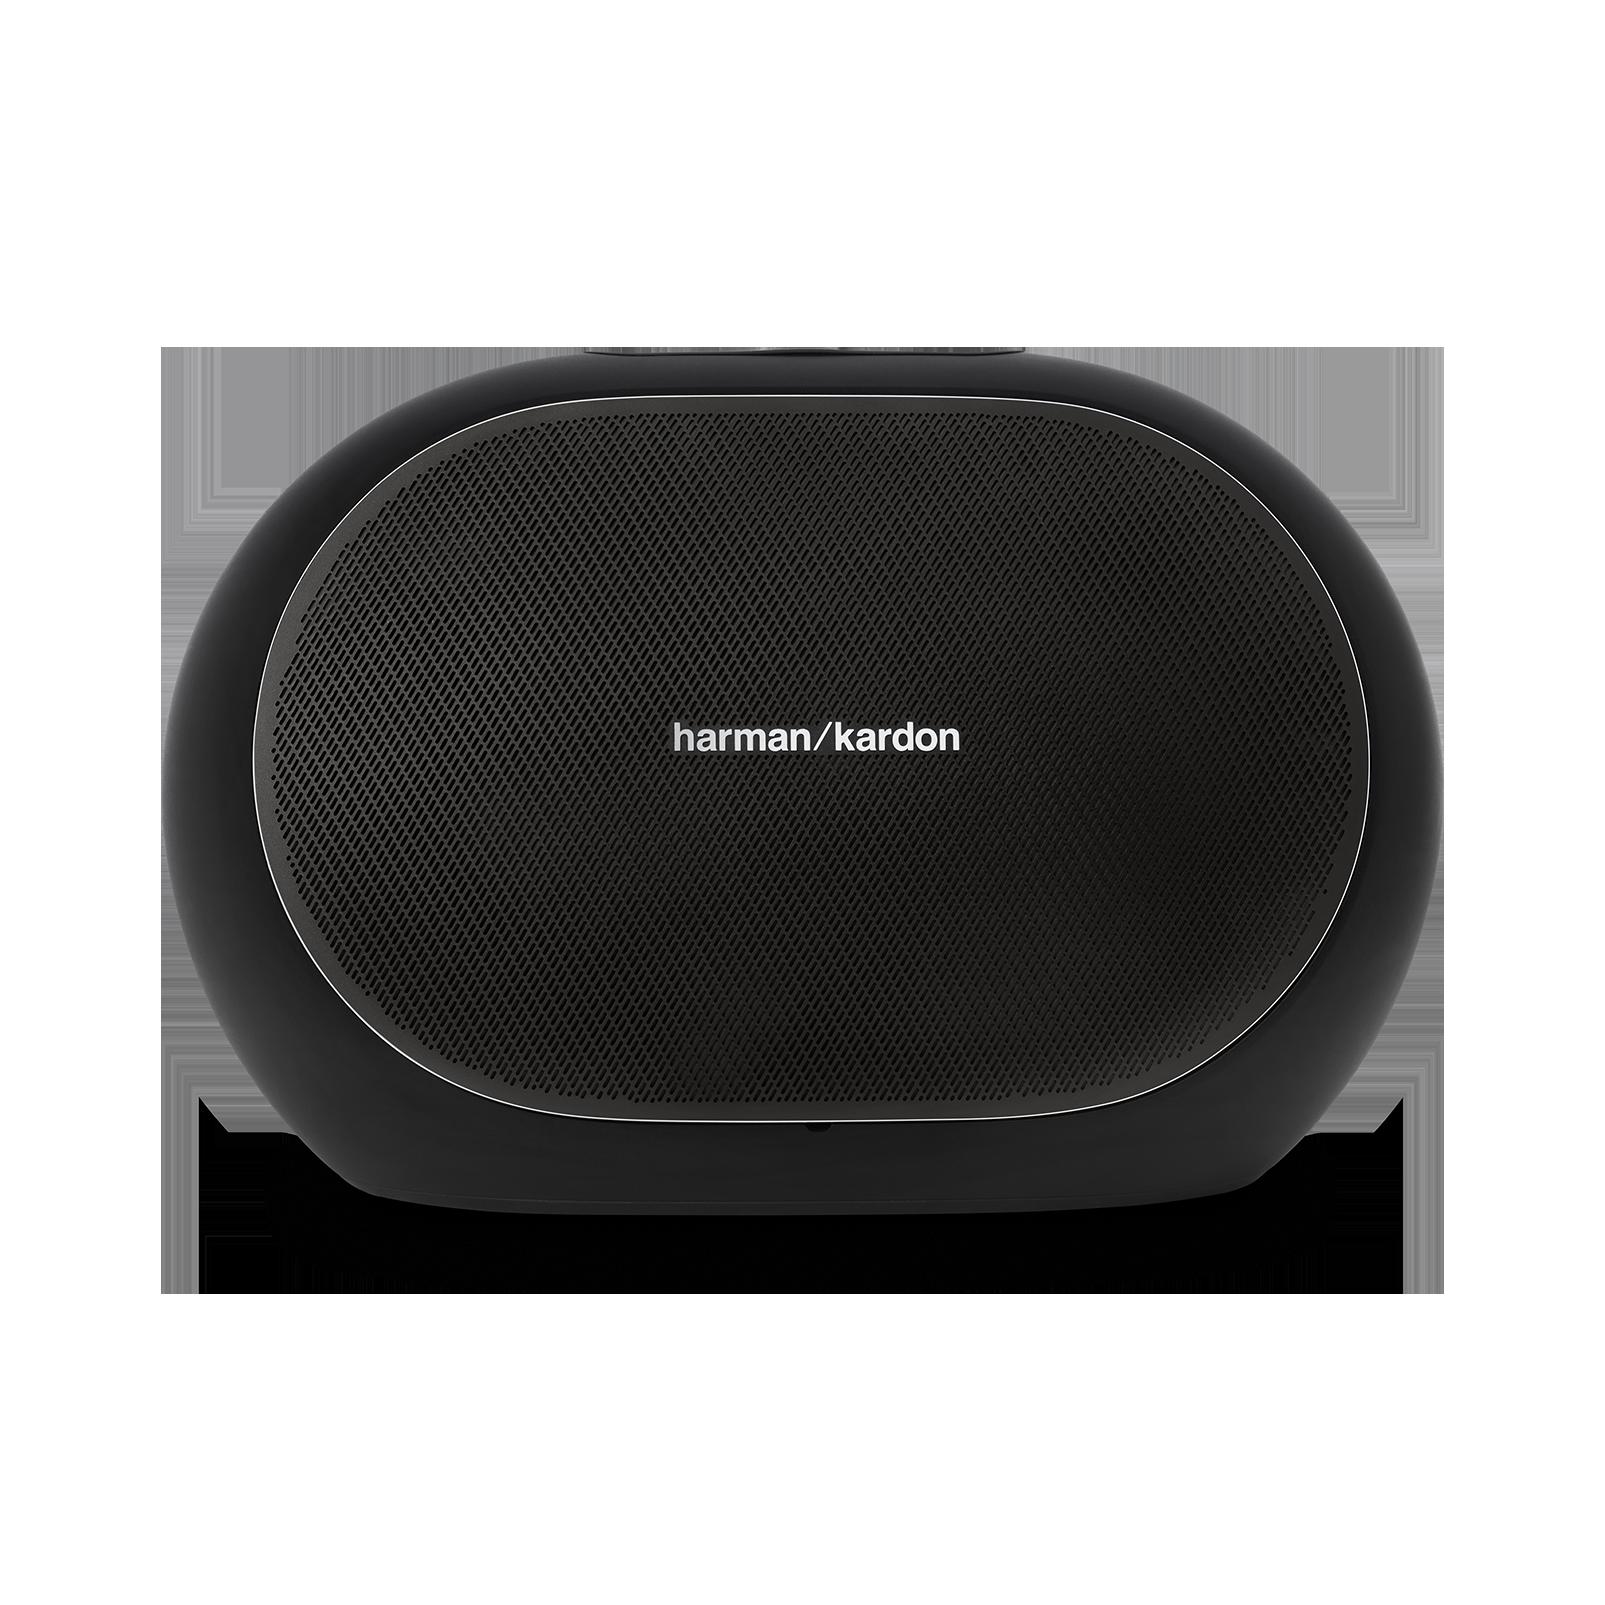 Omni 50+ - Black - Wireless HD Indoor/Outdoor speaker with rechargeable battery - Front